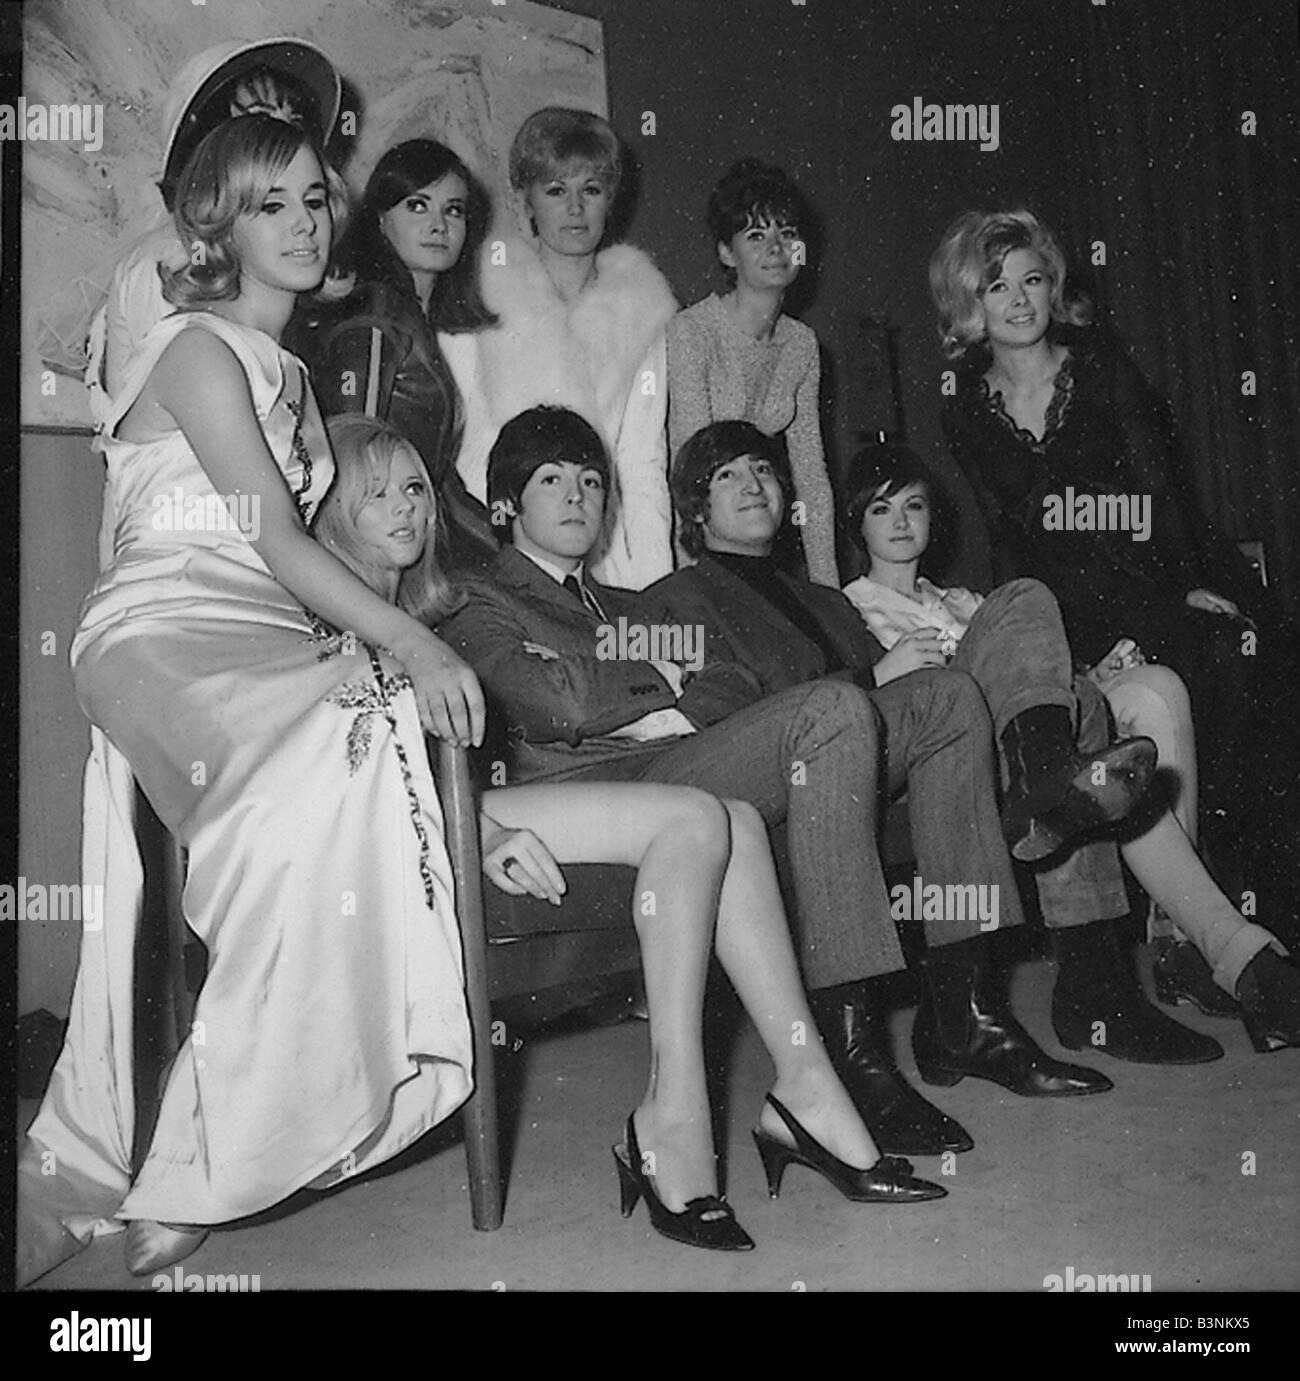 Beatles 1965 John Lennonand Paul Mccartney With Showgirls